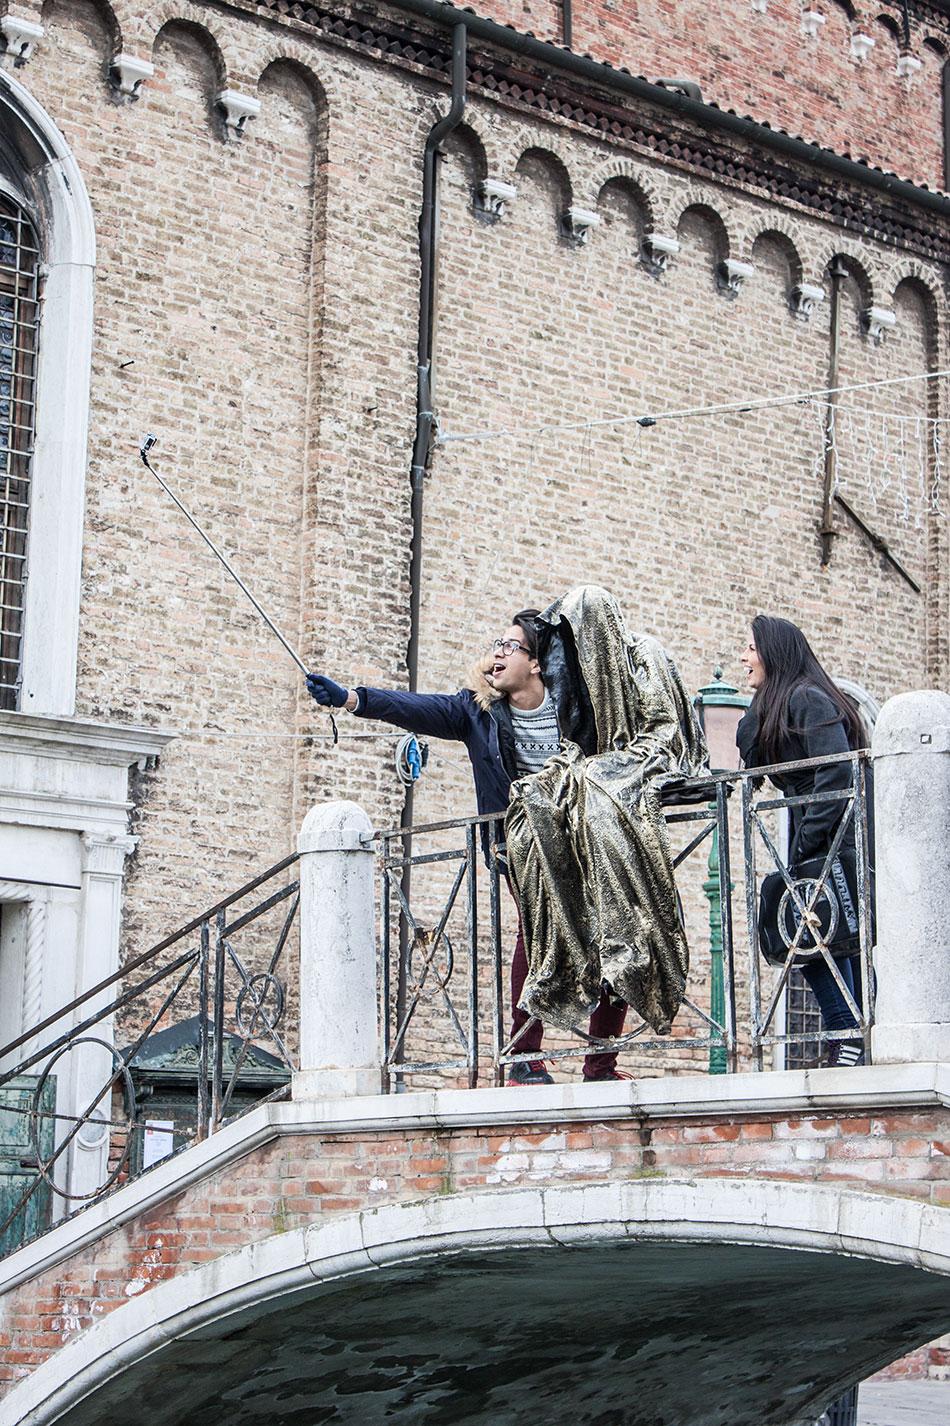 biennale-art-italia-venice-murano-glas-berengo-show-guardians-of-time-manfred-kielnhofer-public-contemporary-art-sculpture-design-7216